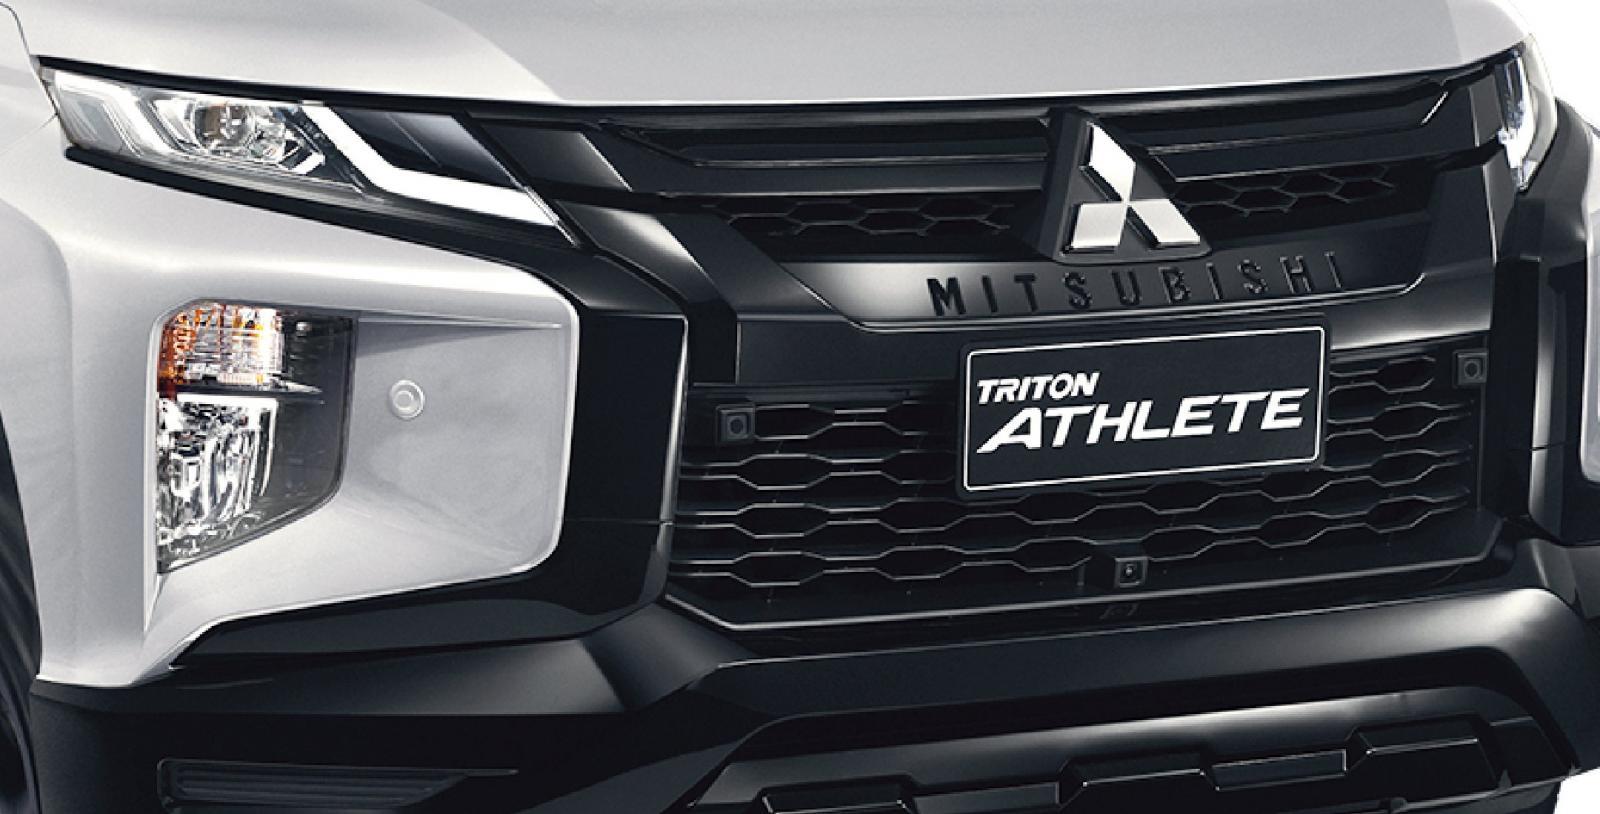 2021 Mitsubishi Triton Athlete GT